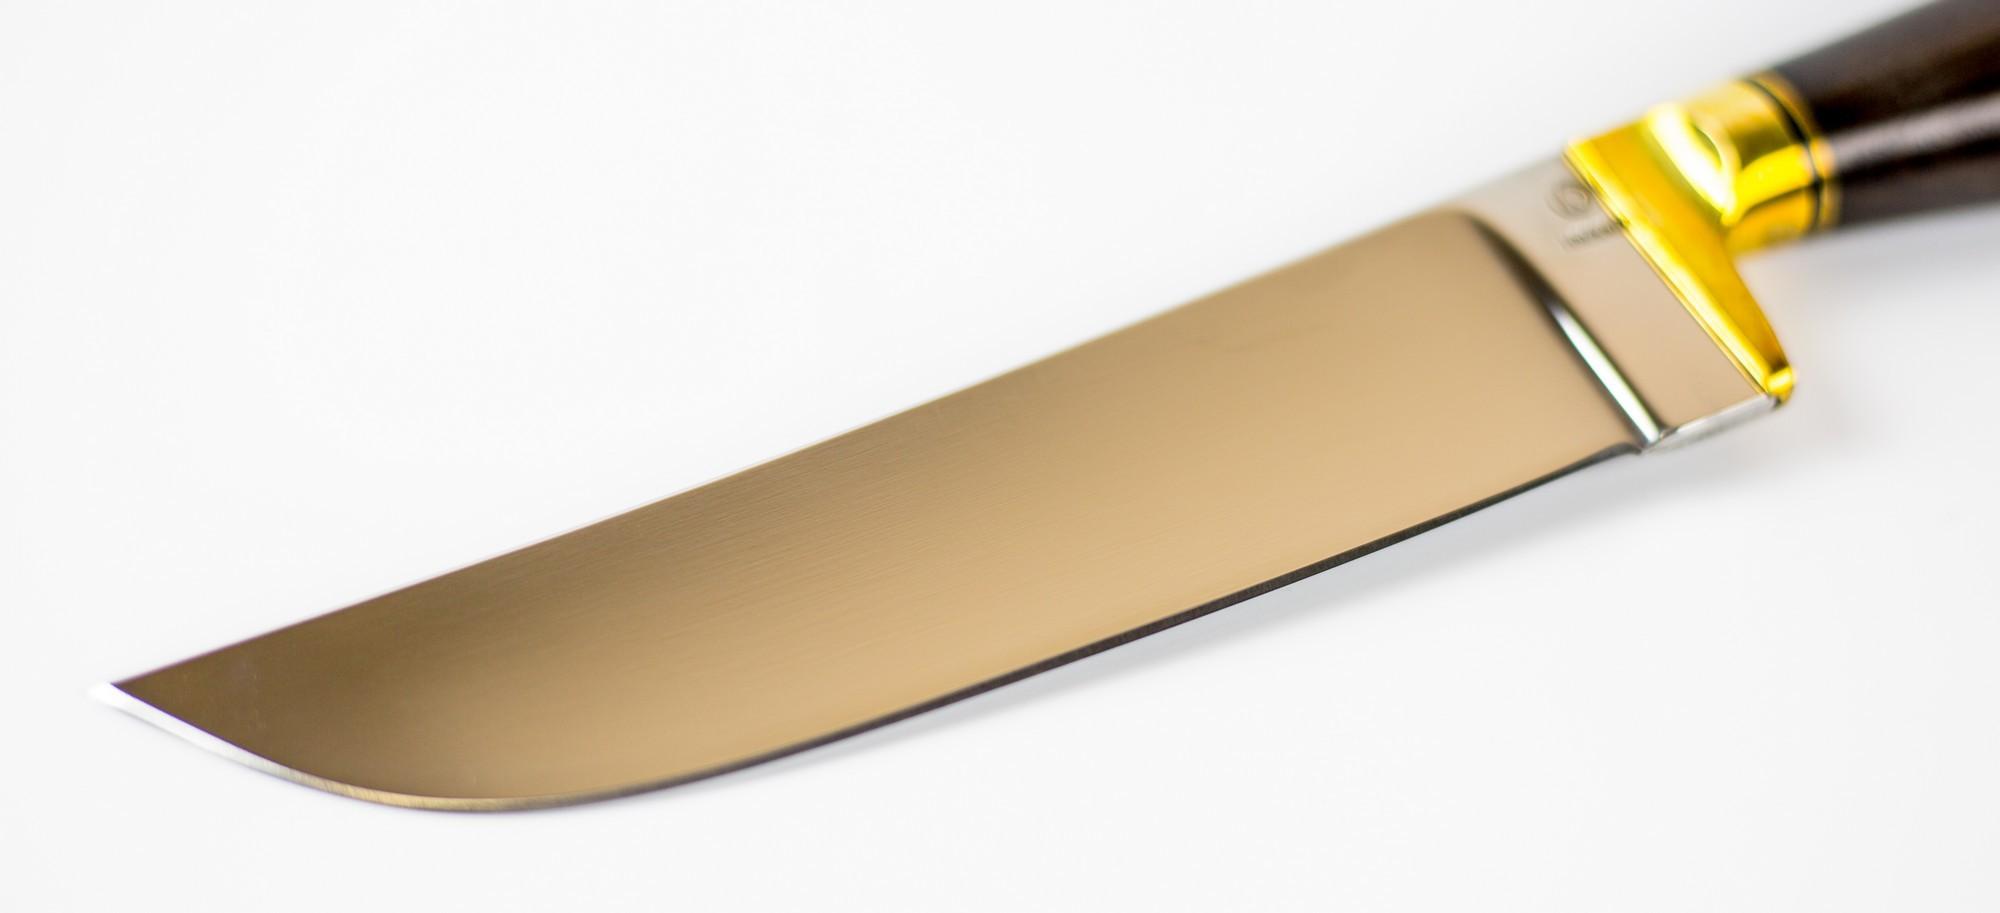 Фото 7 - Нож Узбек, сталь 110х18 от Ножи Крутова